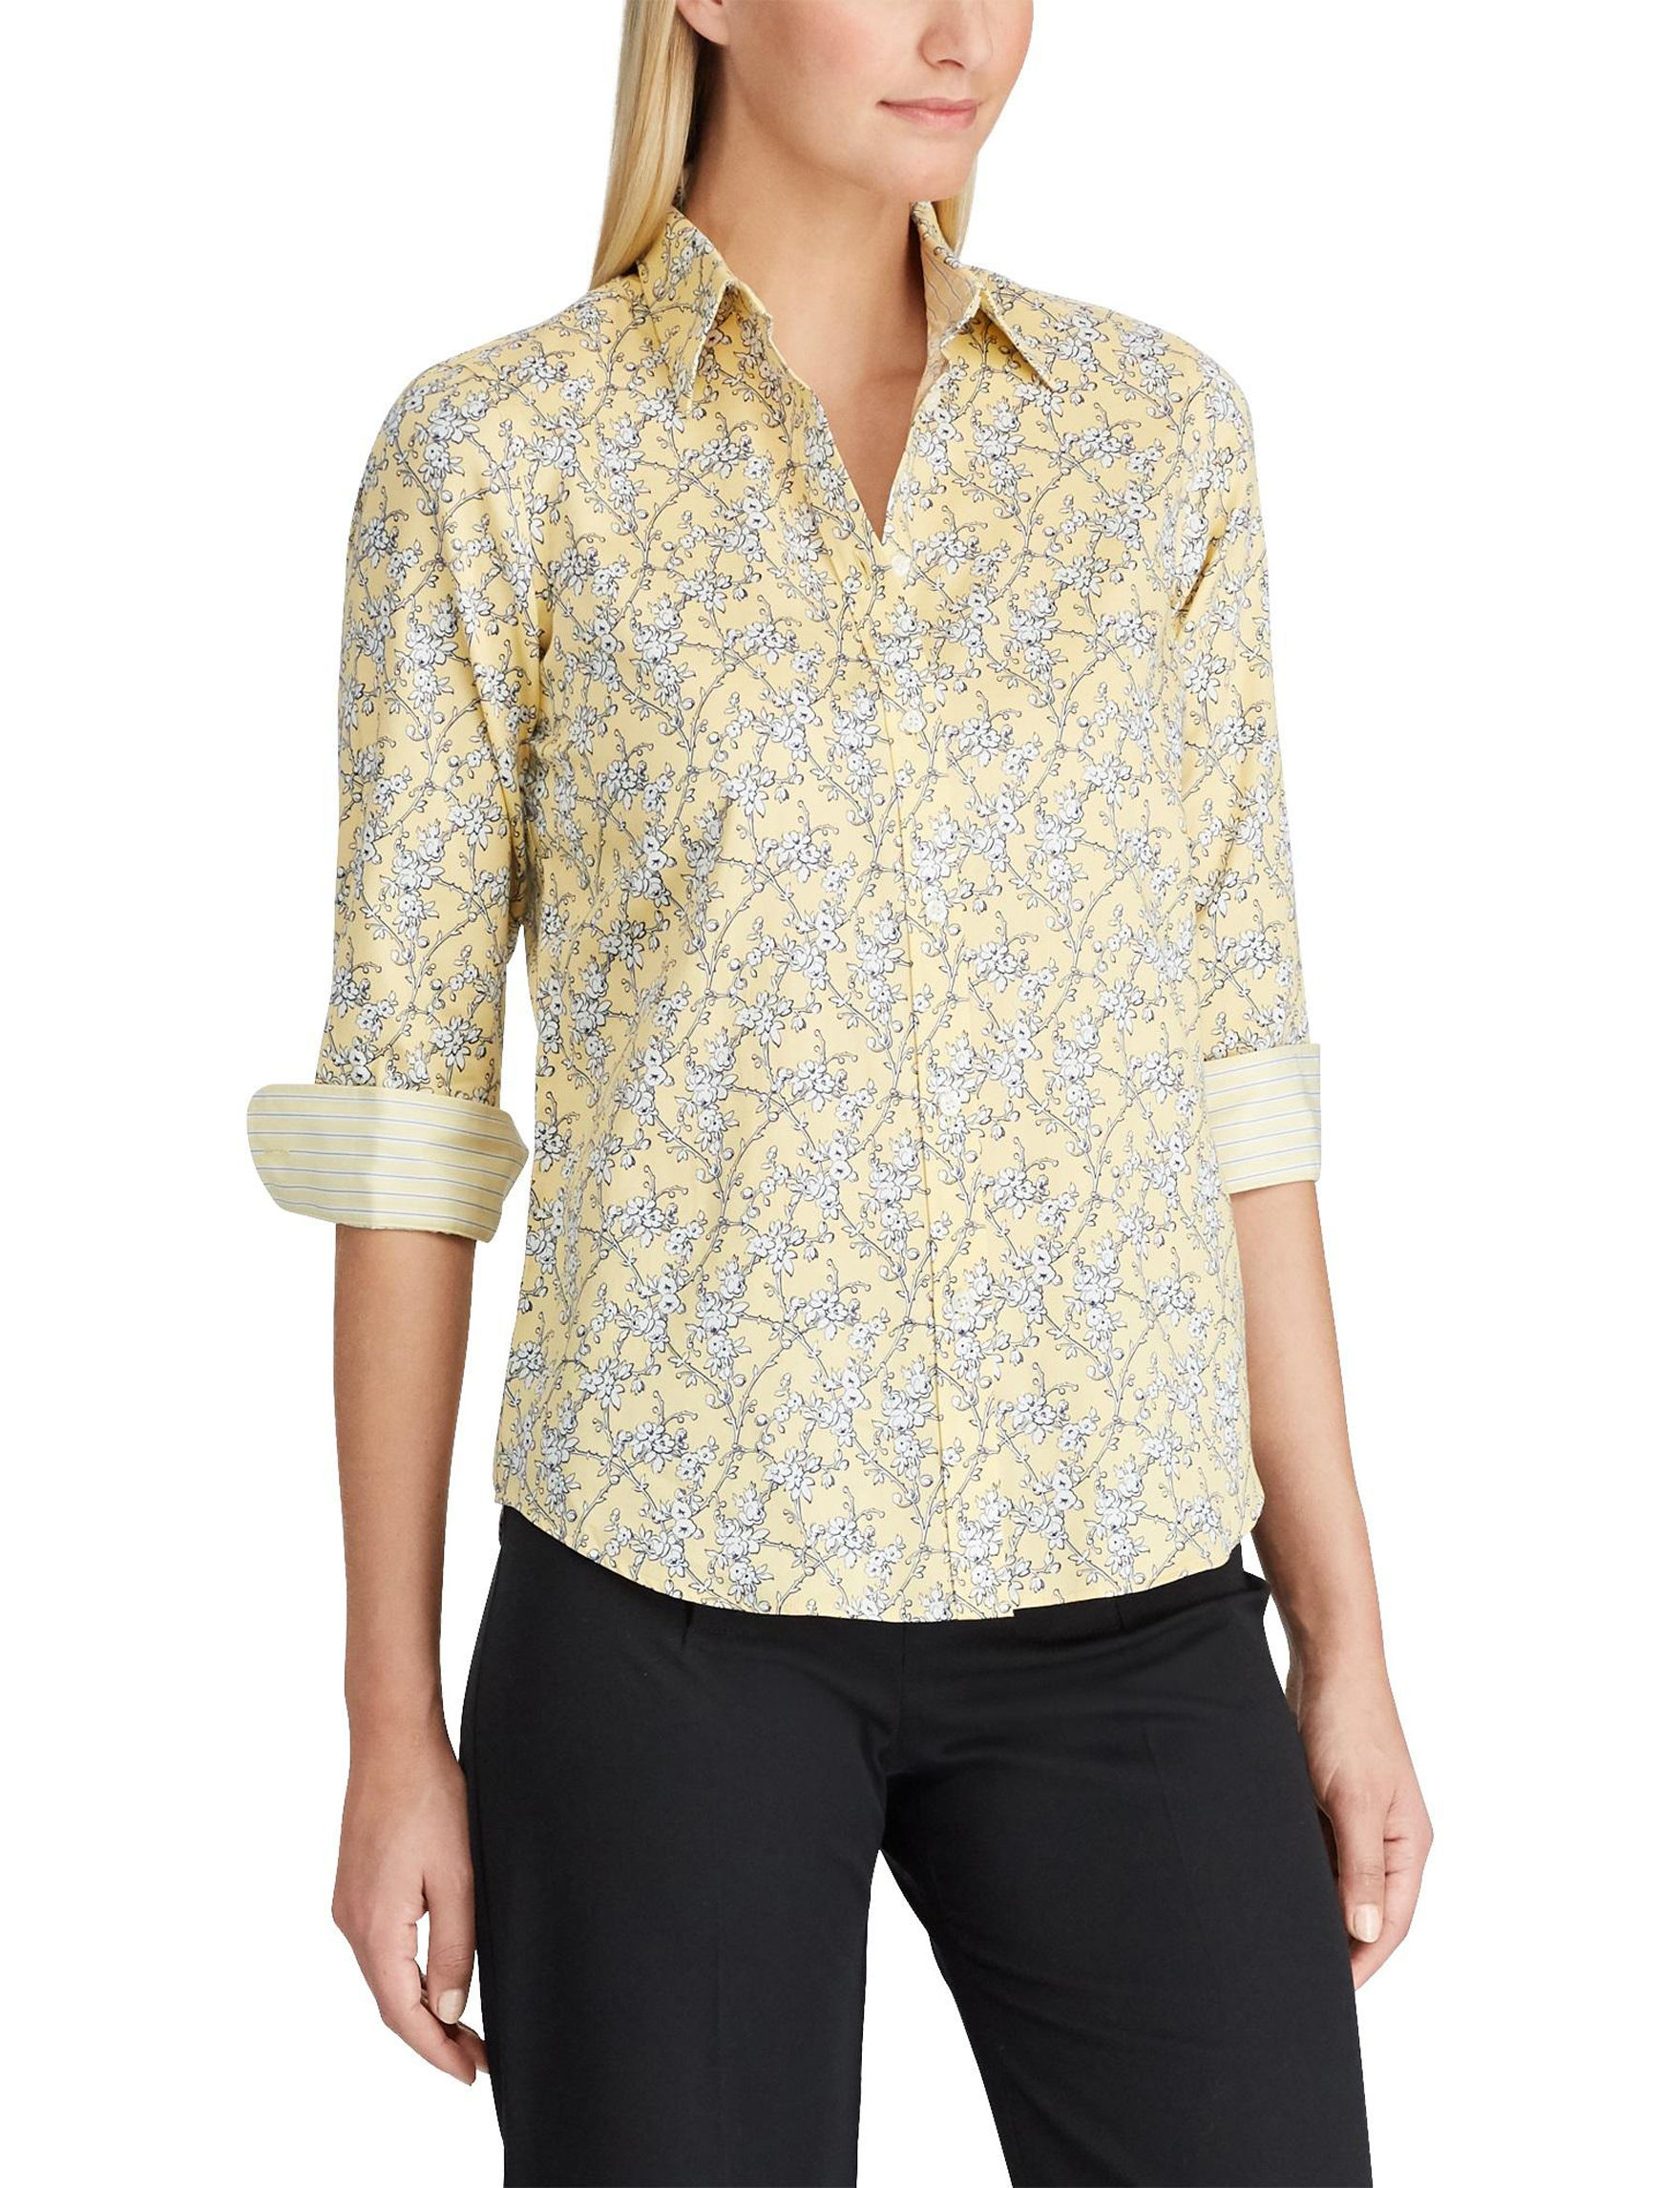 Chaps Yellow Shirts & Blouses